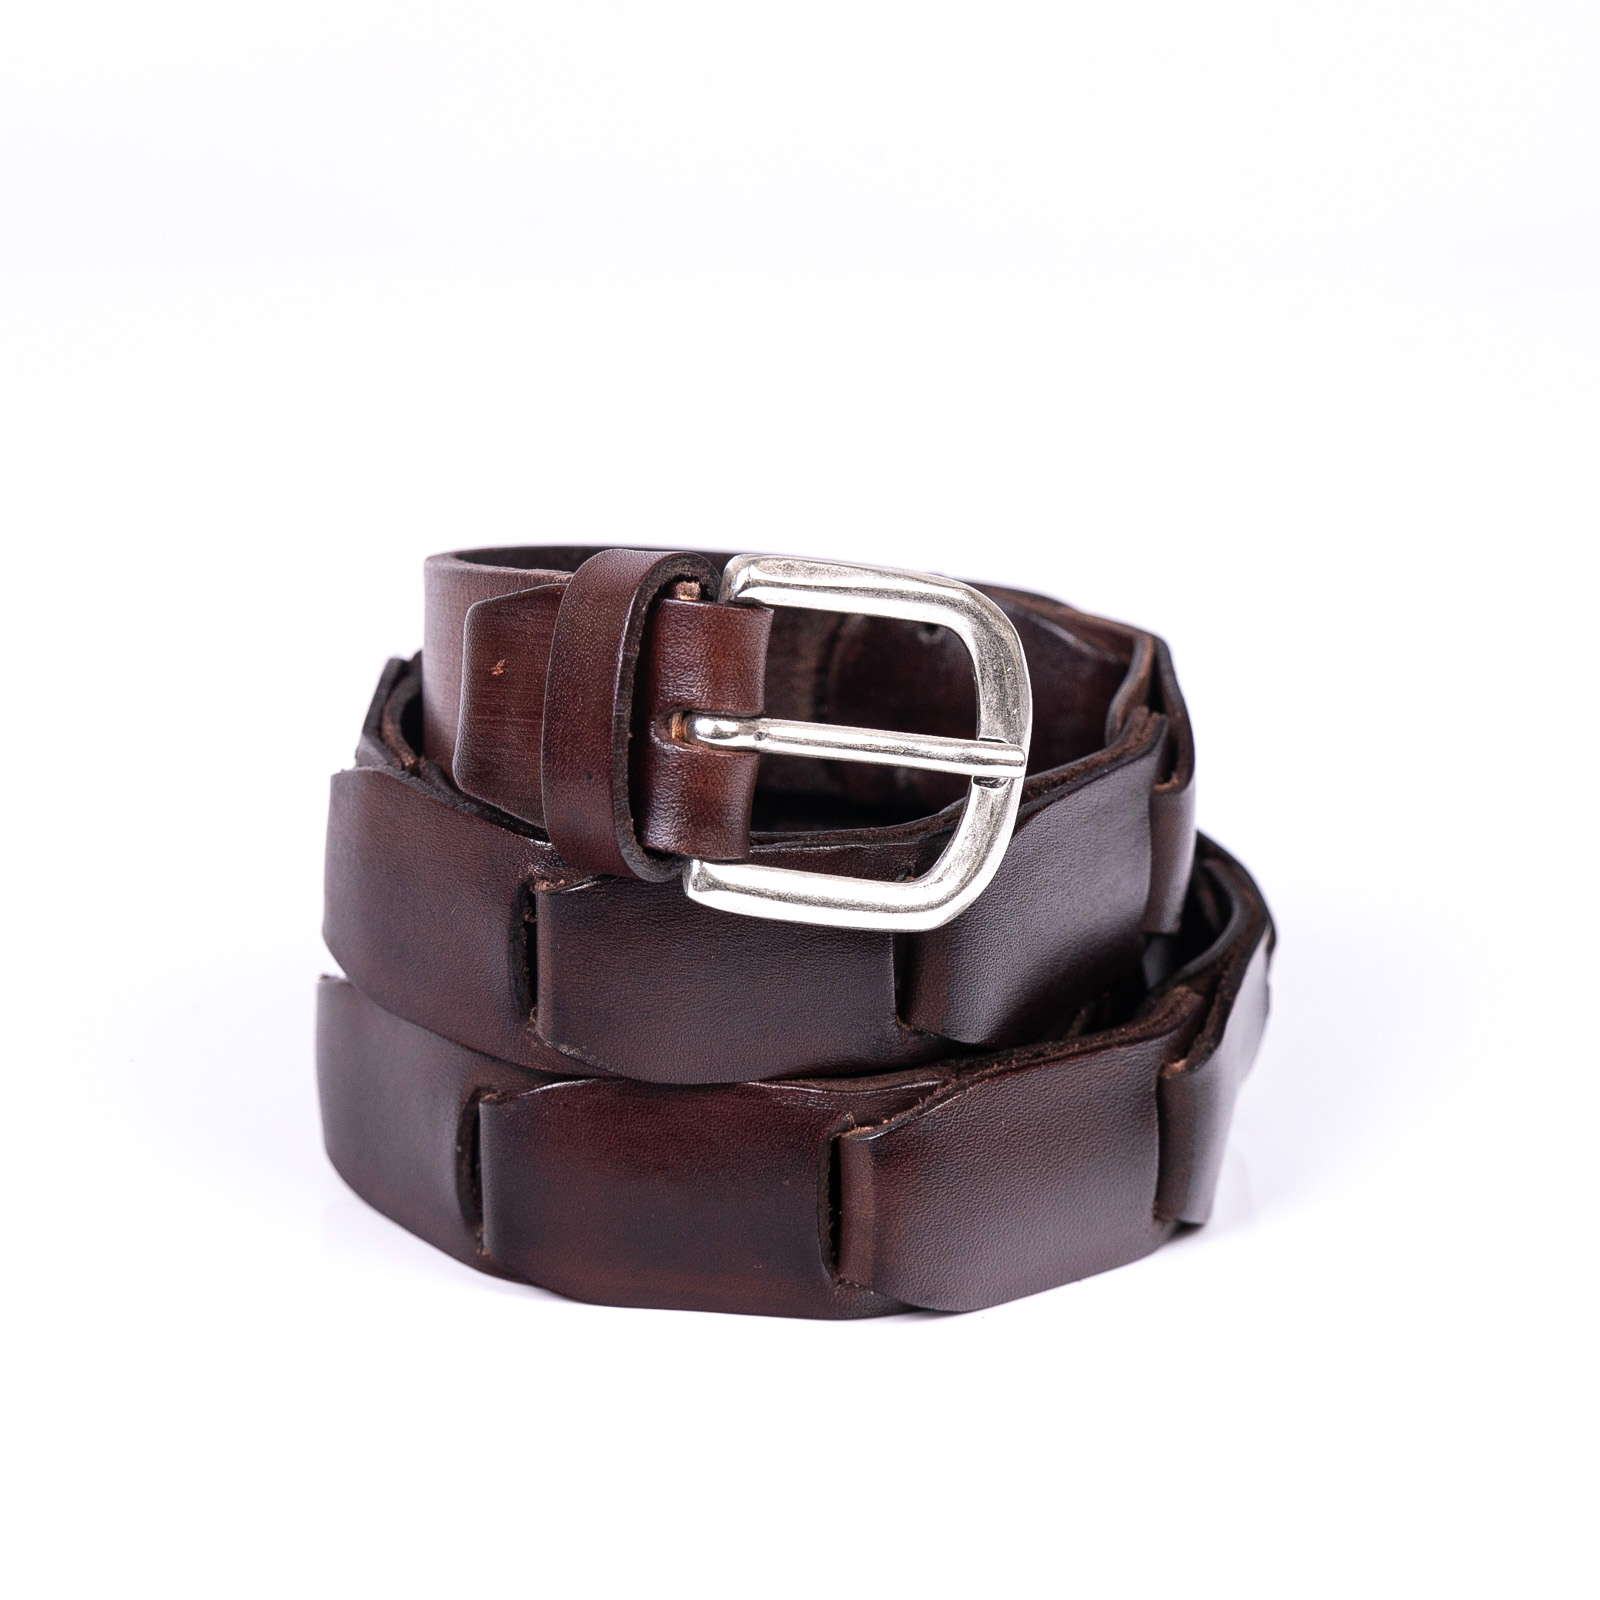 Cintura in pelle alberto luti ALBERTO LUTI | Cintura | 699-30TN